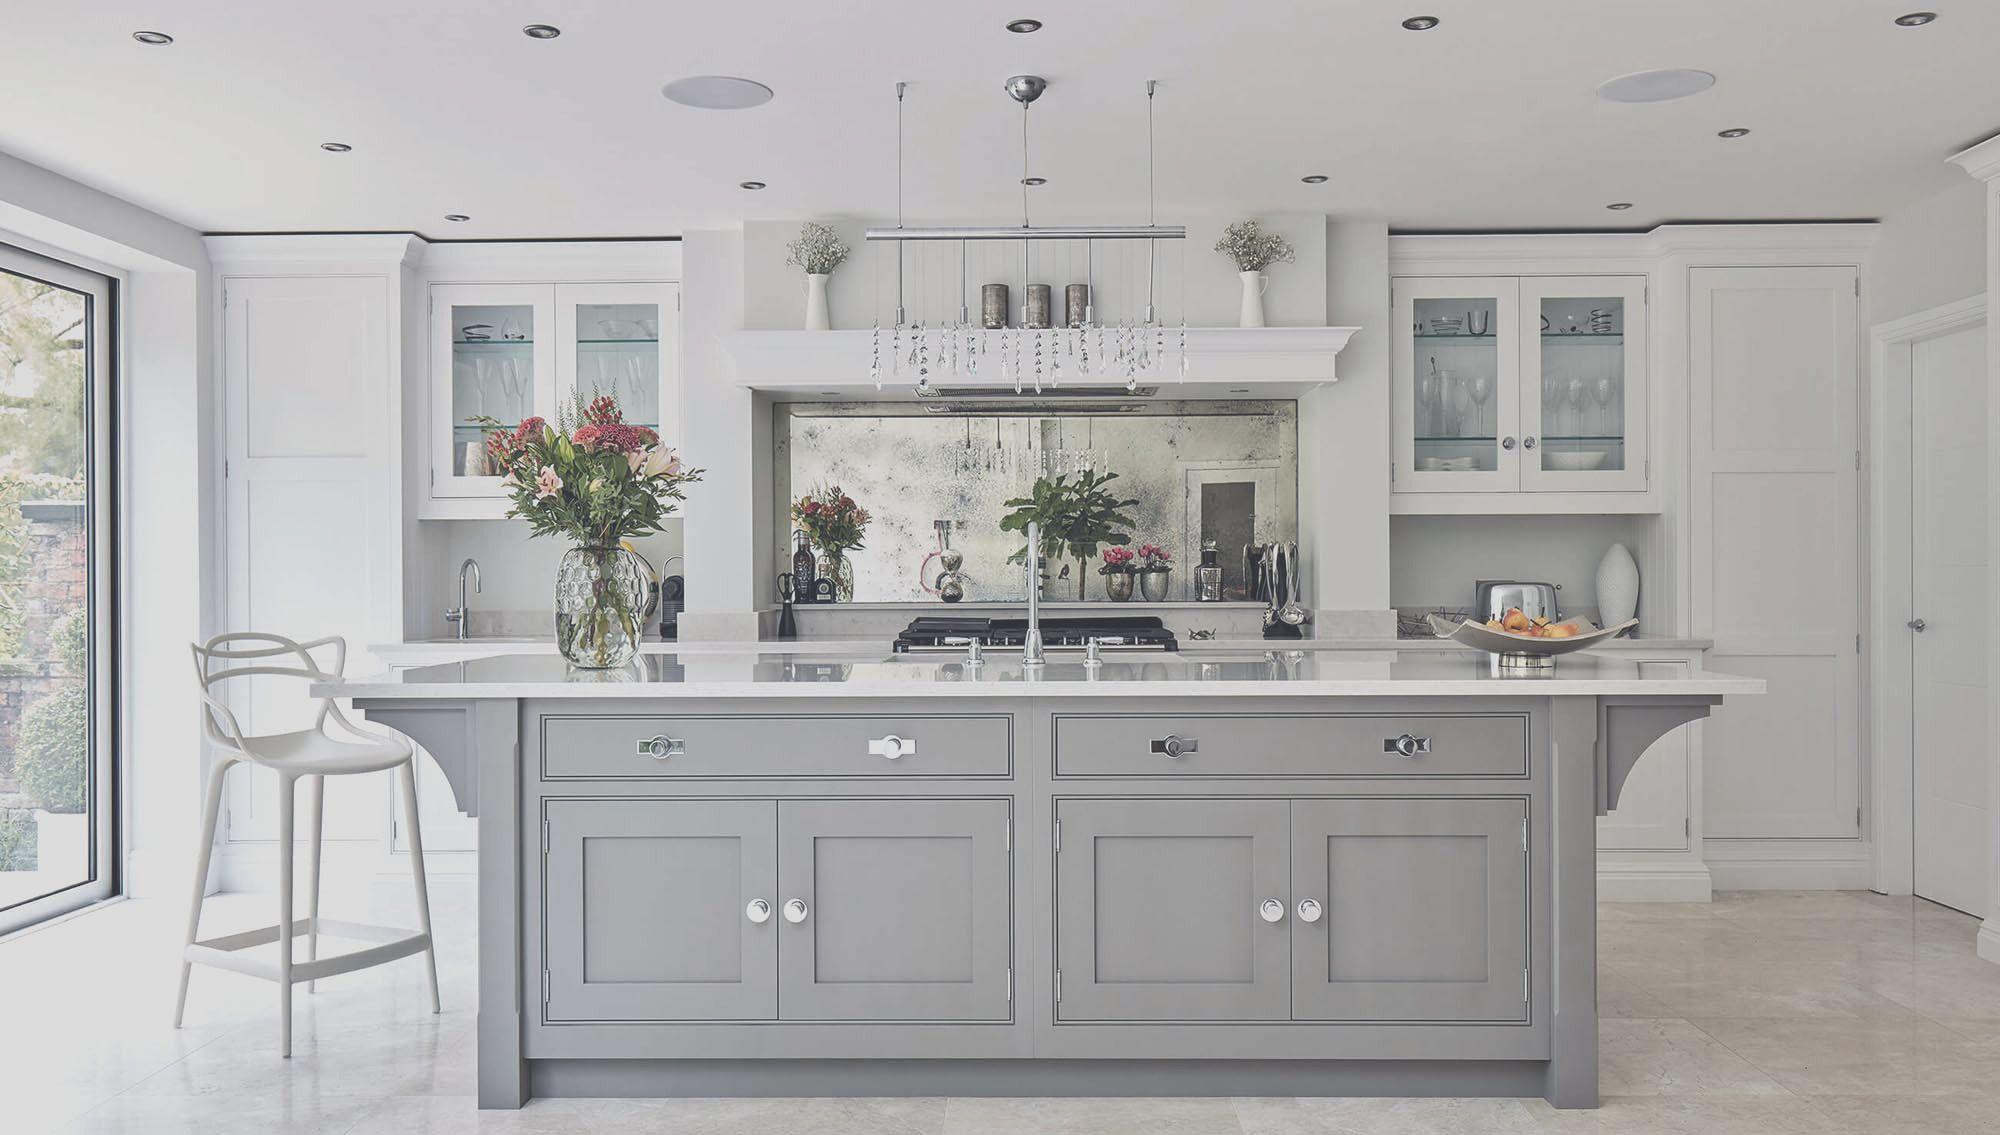 45 Stunning New White Kichen Decor Ideas For 2020